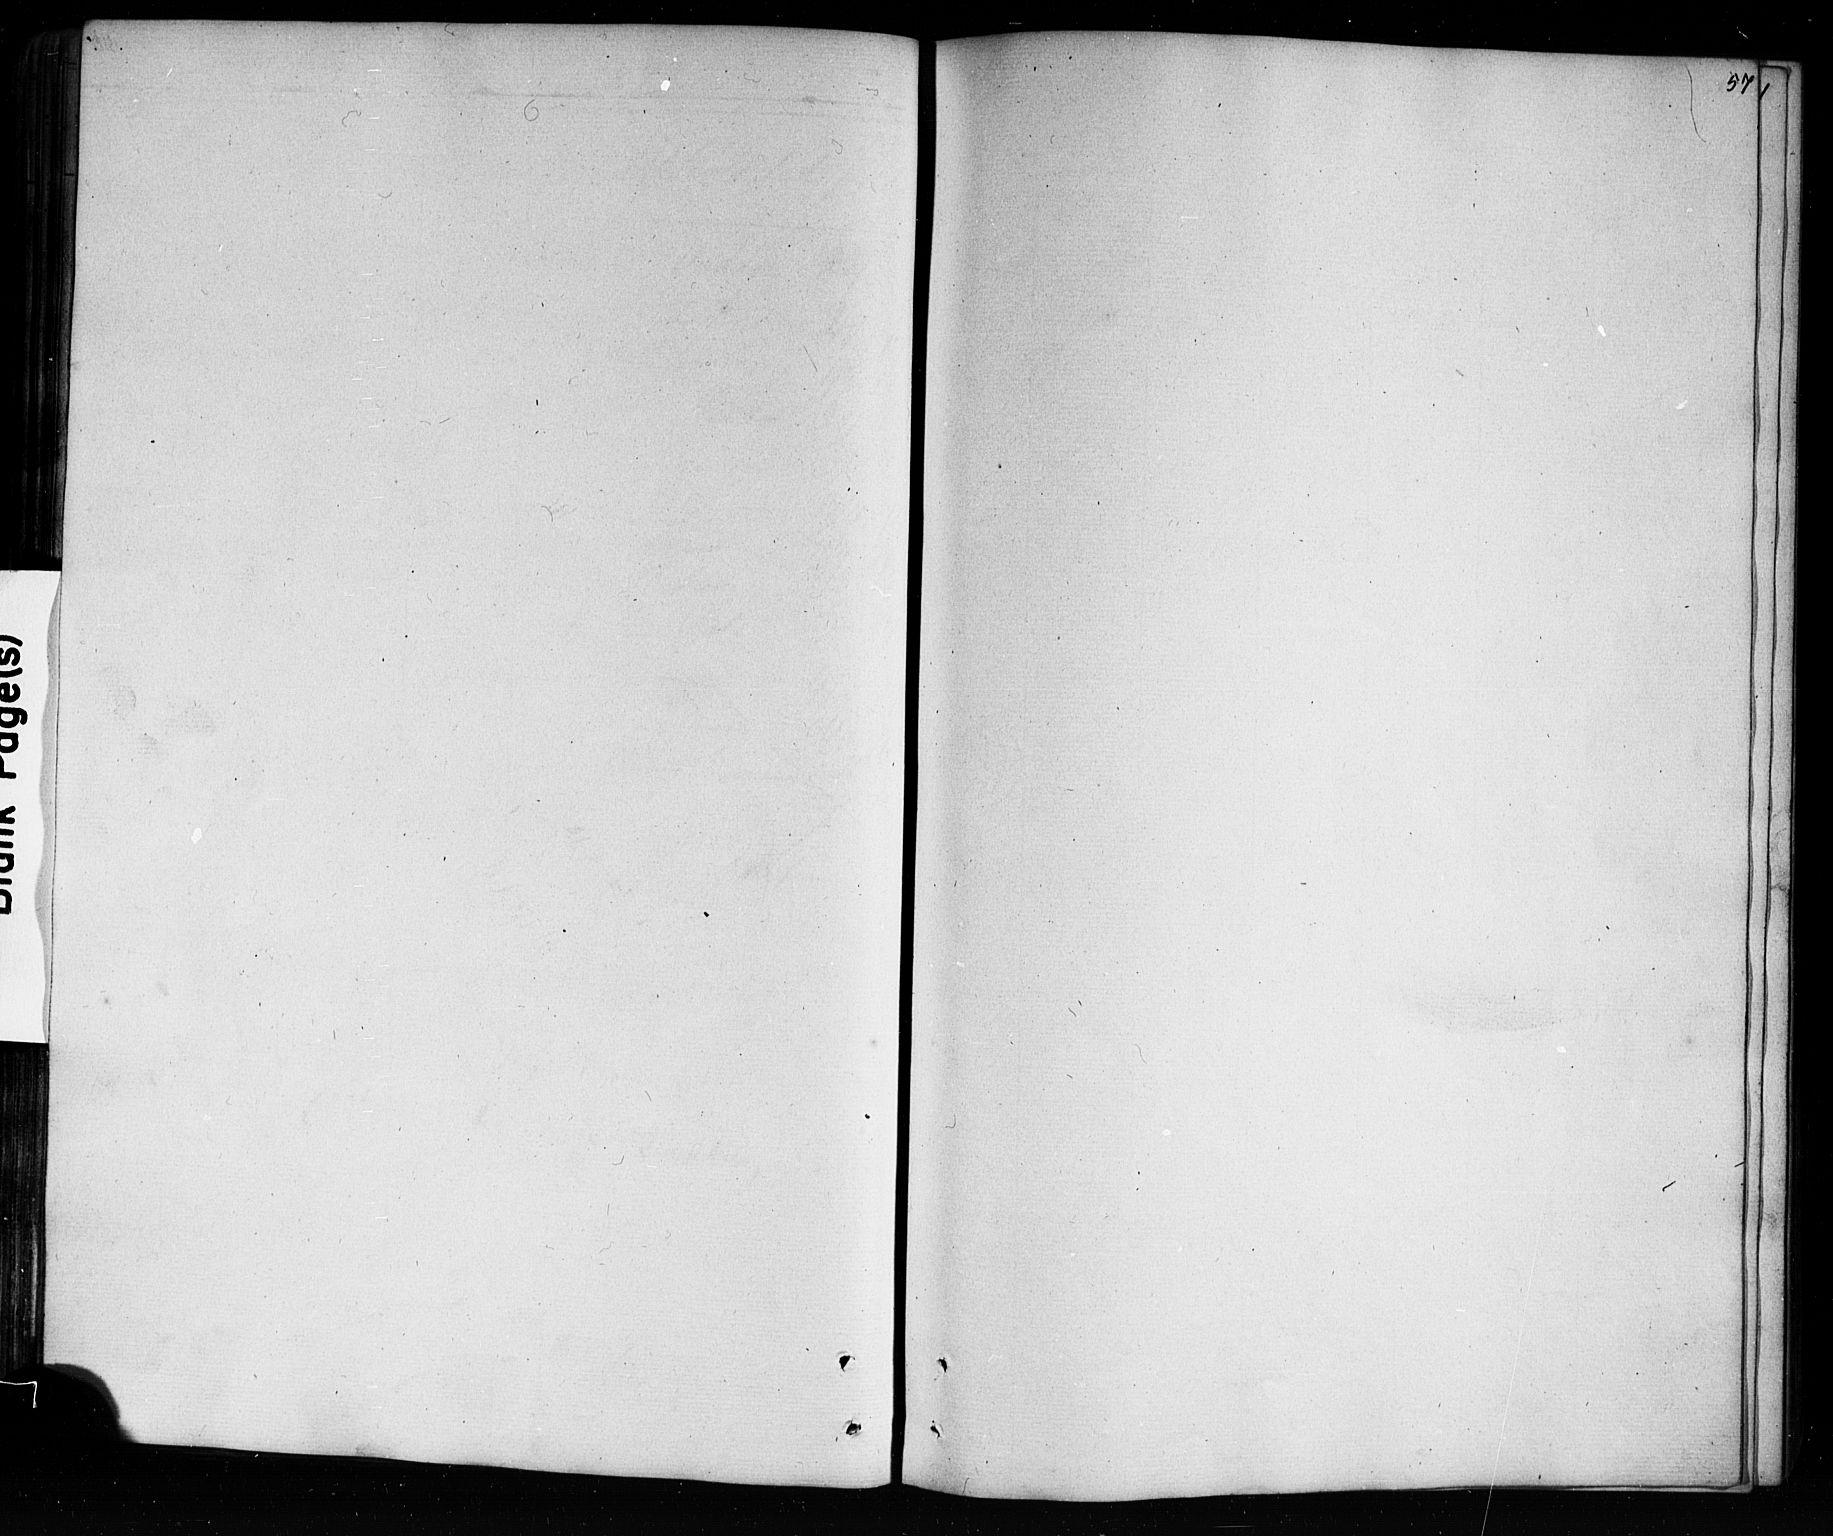 SAKO, Mo kirkebøker, G/Ga/L0001: Klokkerbok nr. I 1, 1851-1891, s. 57